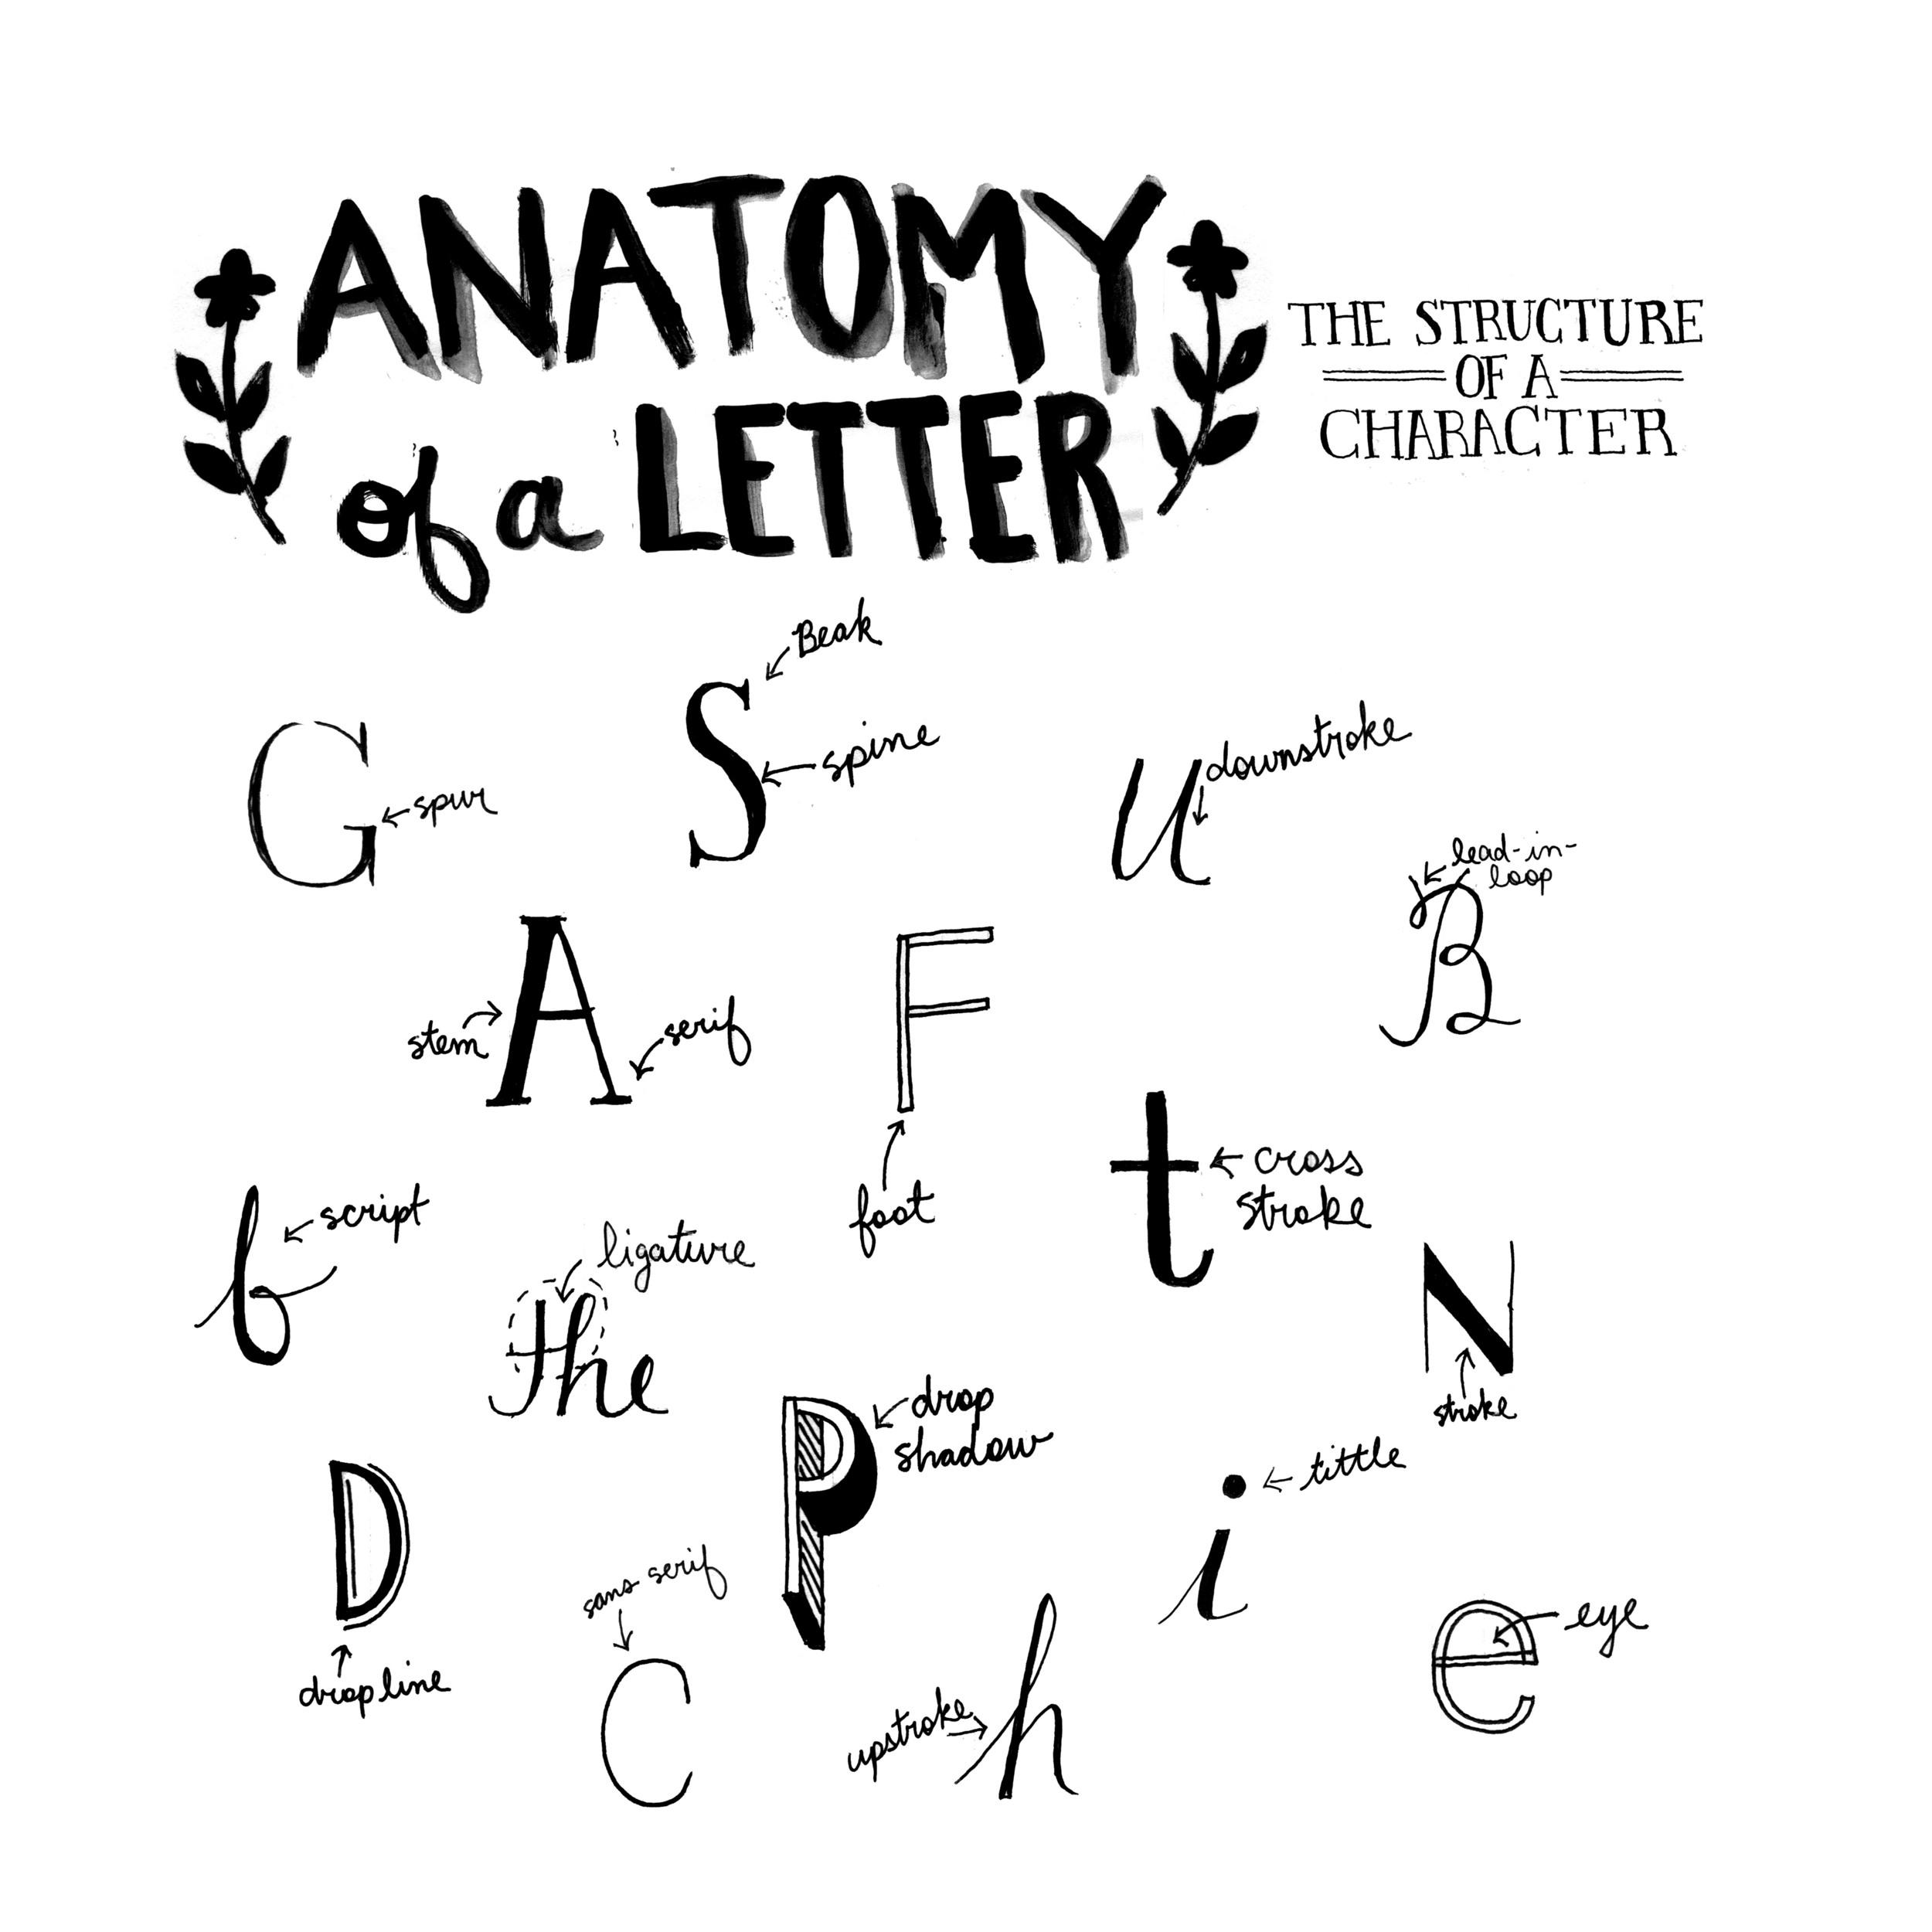 anatomyofaletter.jpg